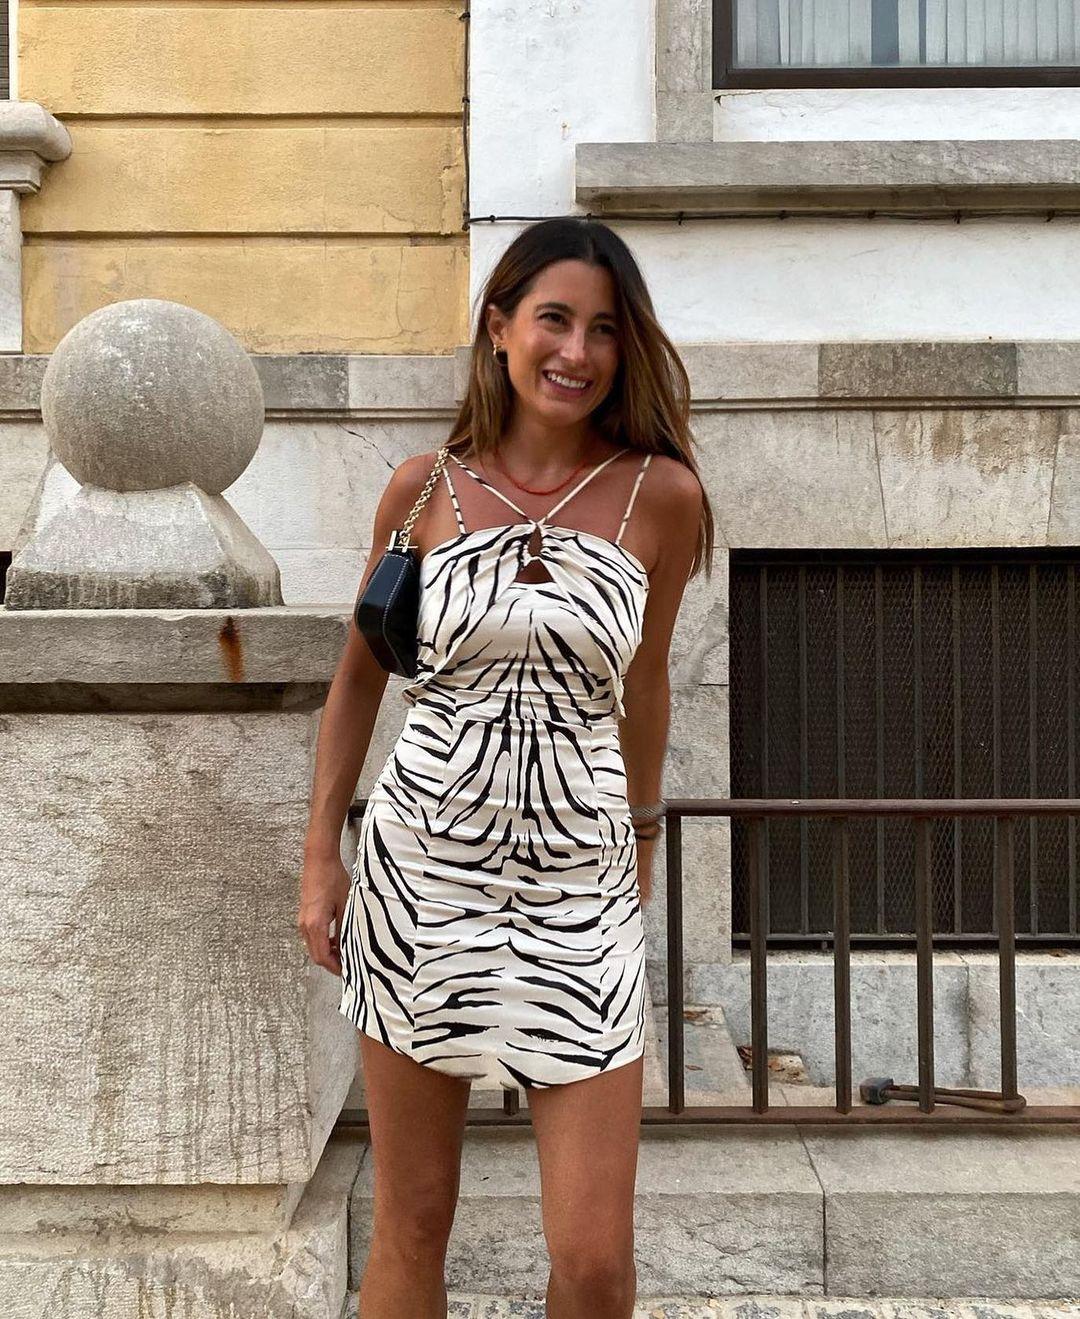 robe courte à imprimé animalier de Zara sur zarastreetstyle